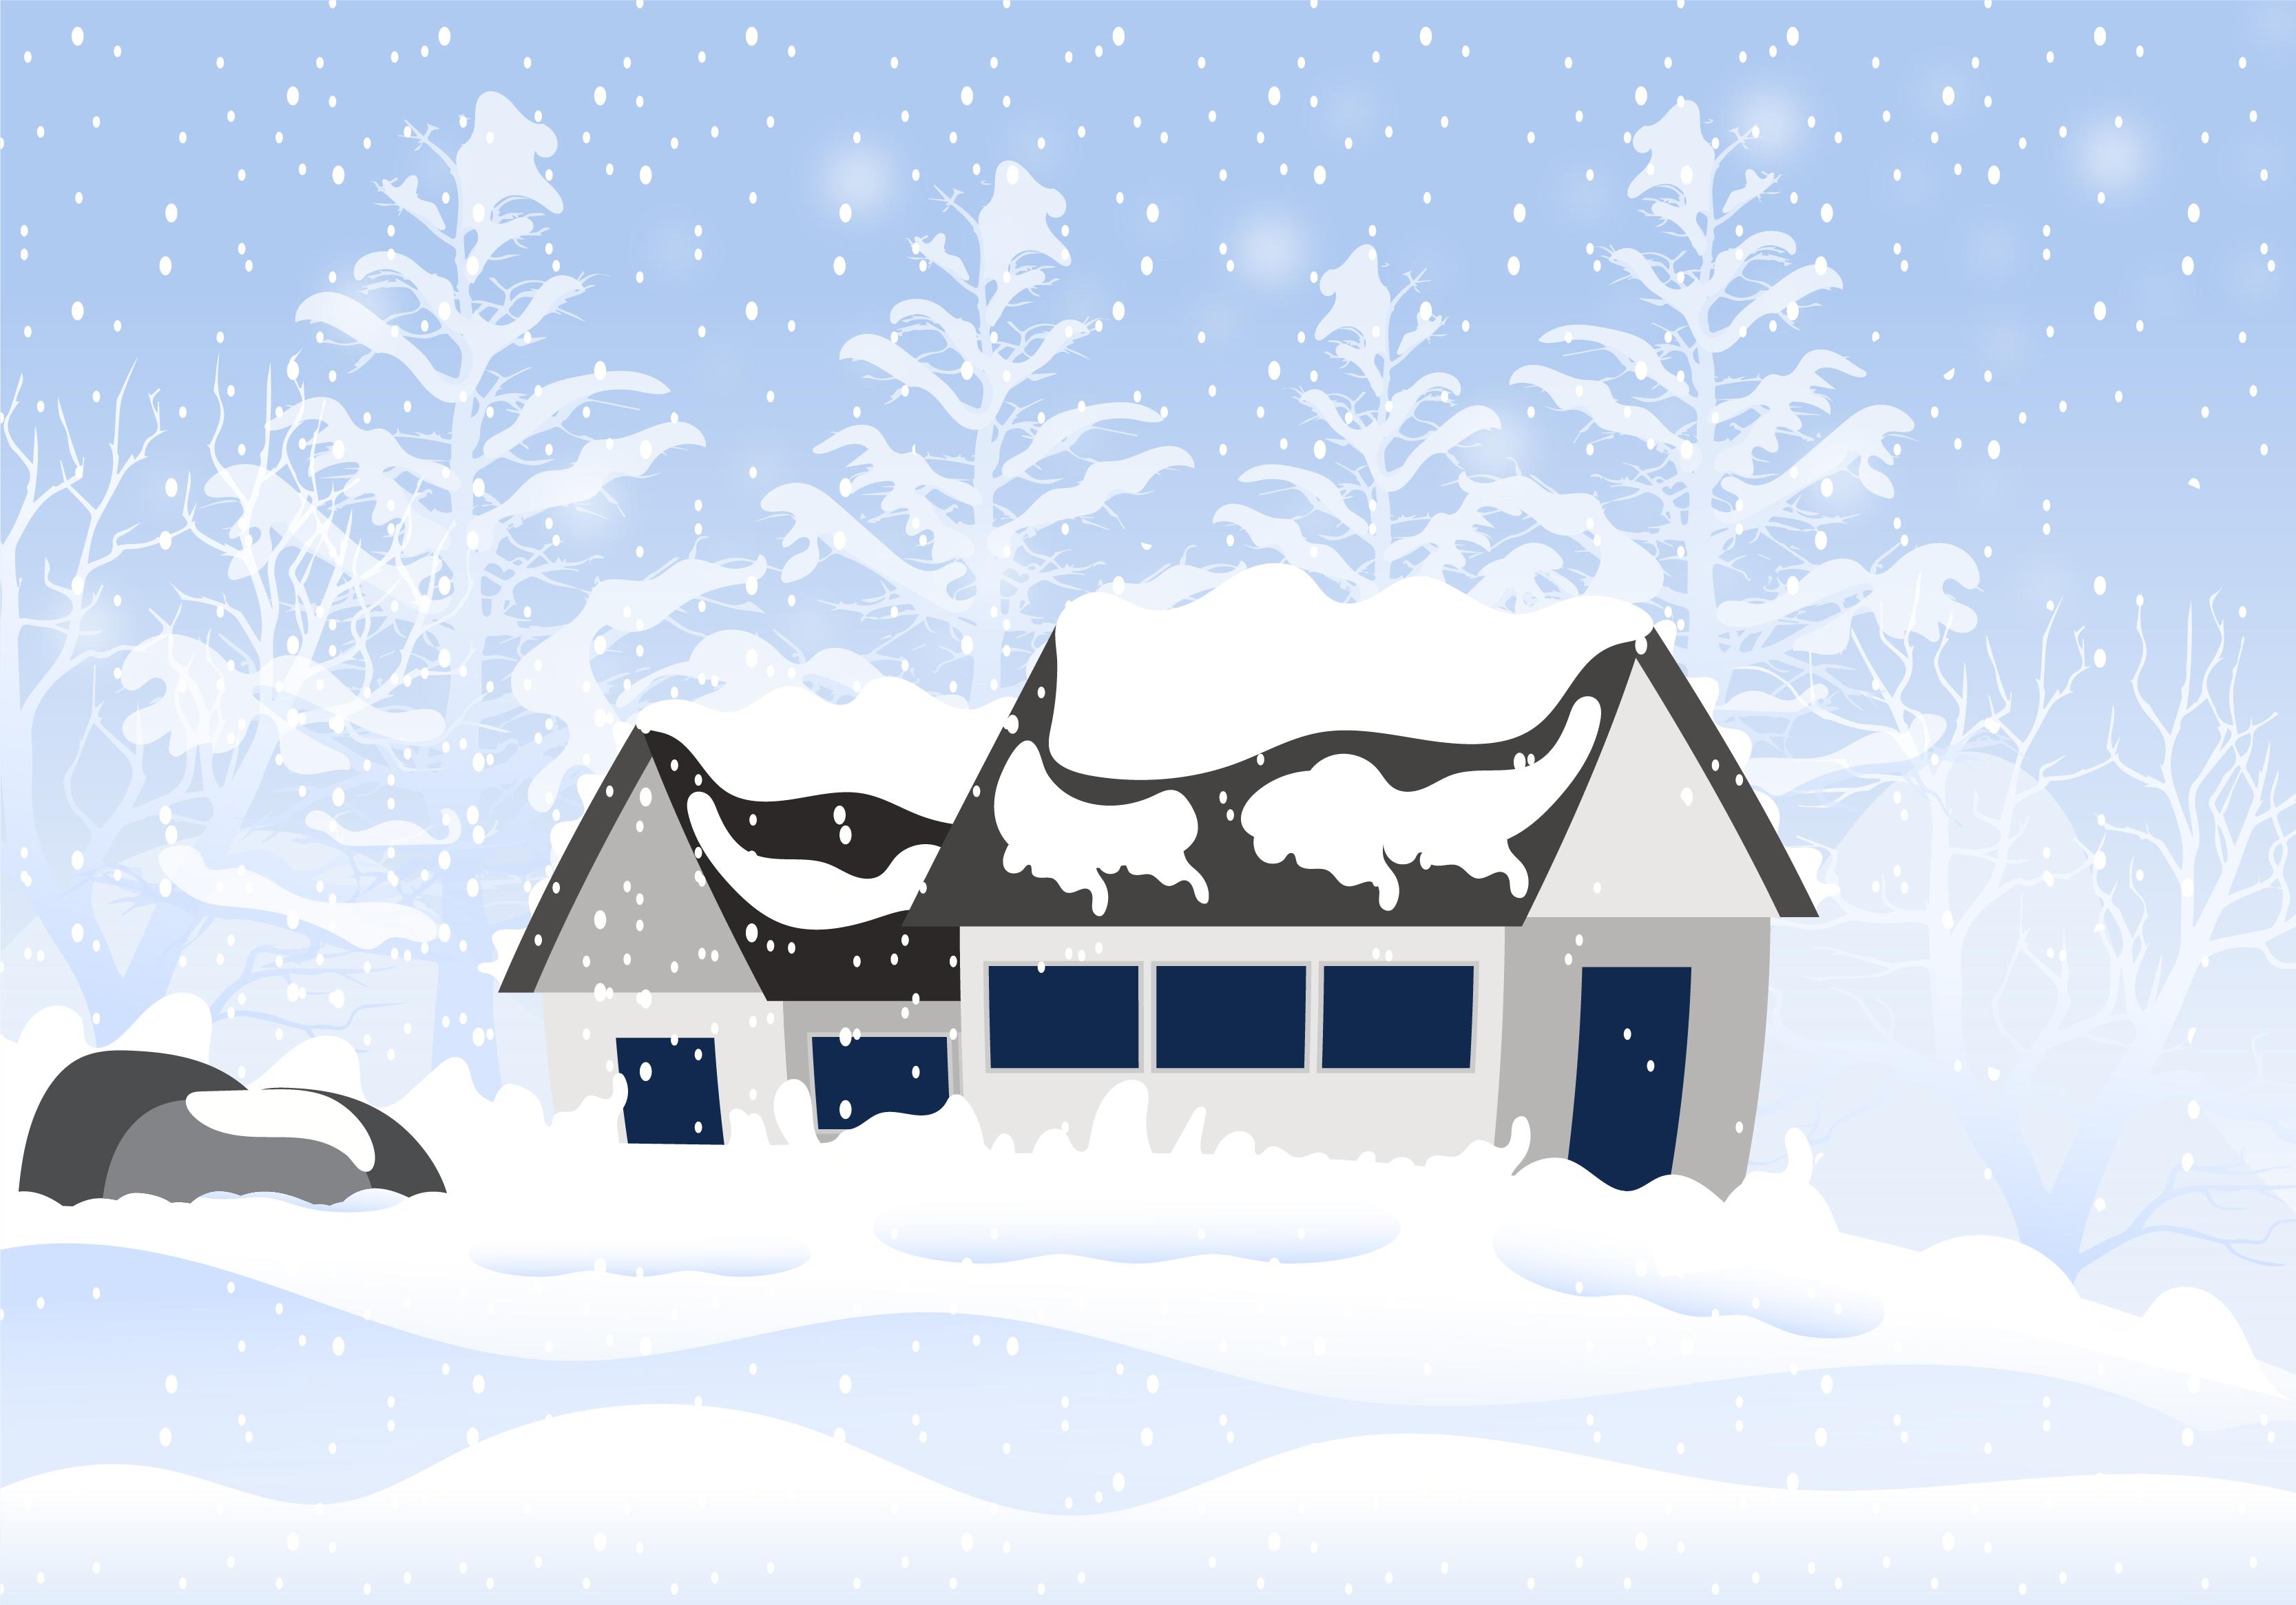 Snow Background Free Vector Art